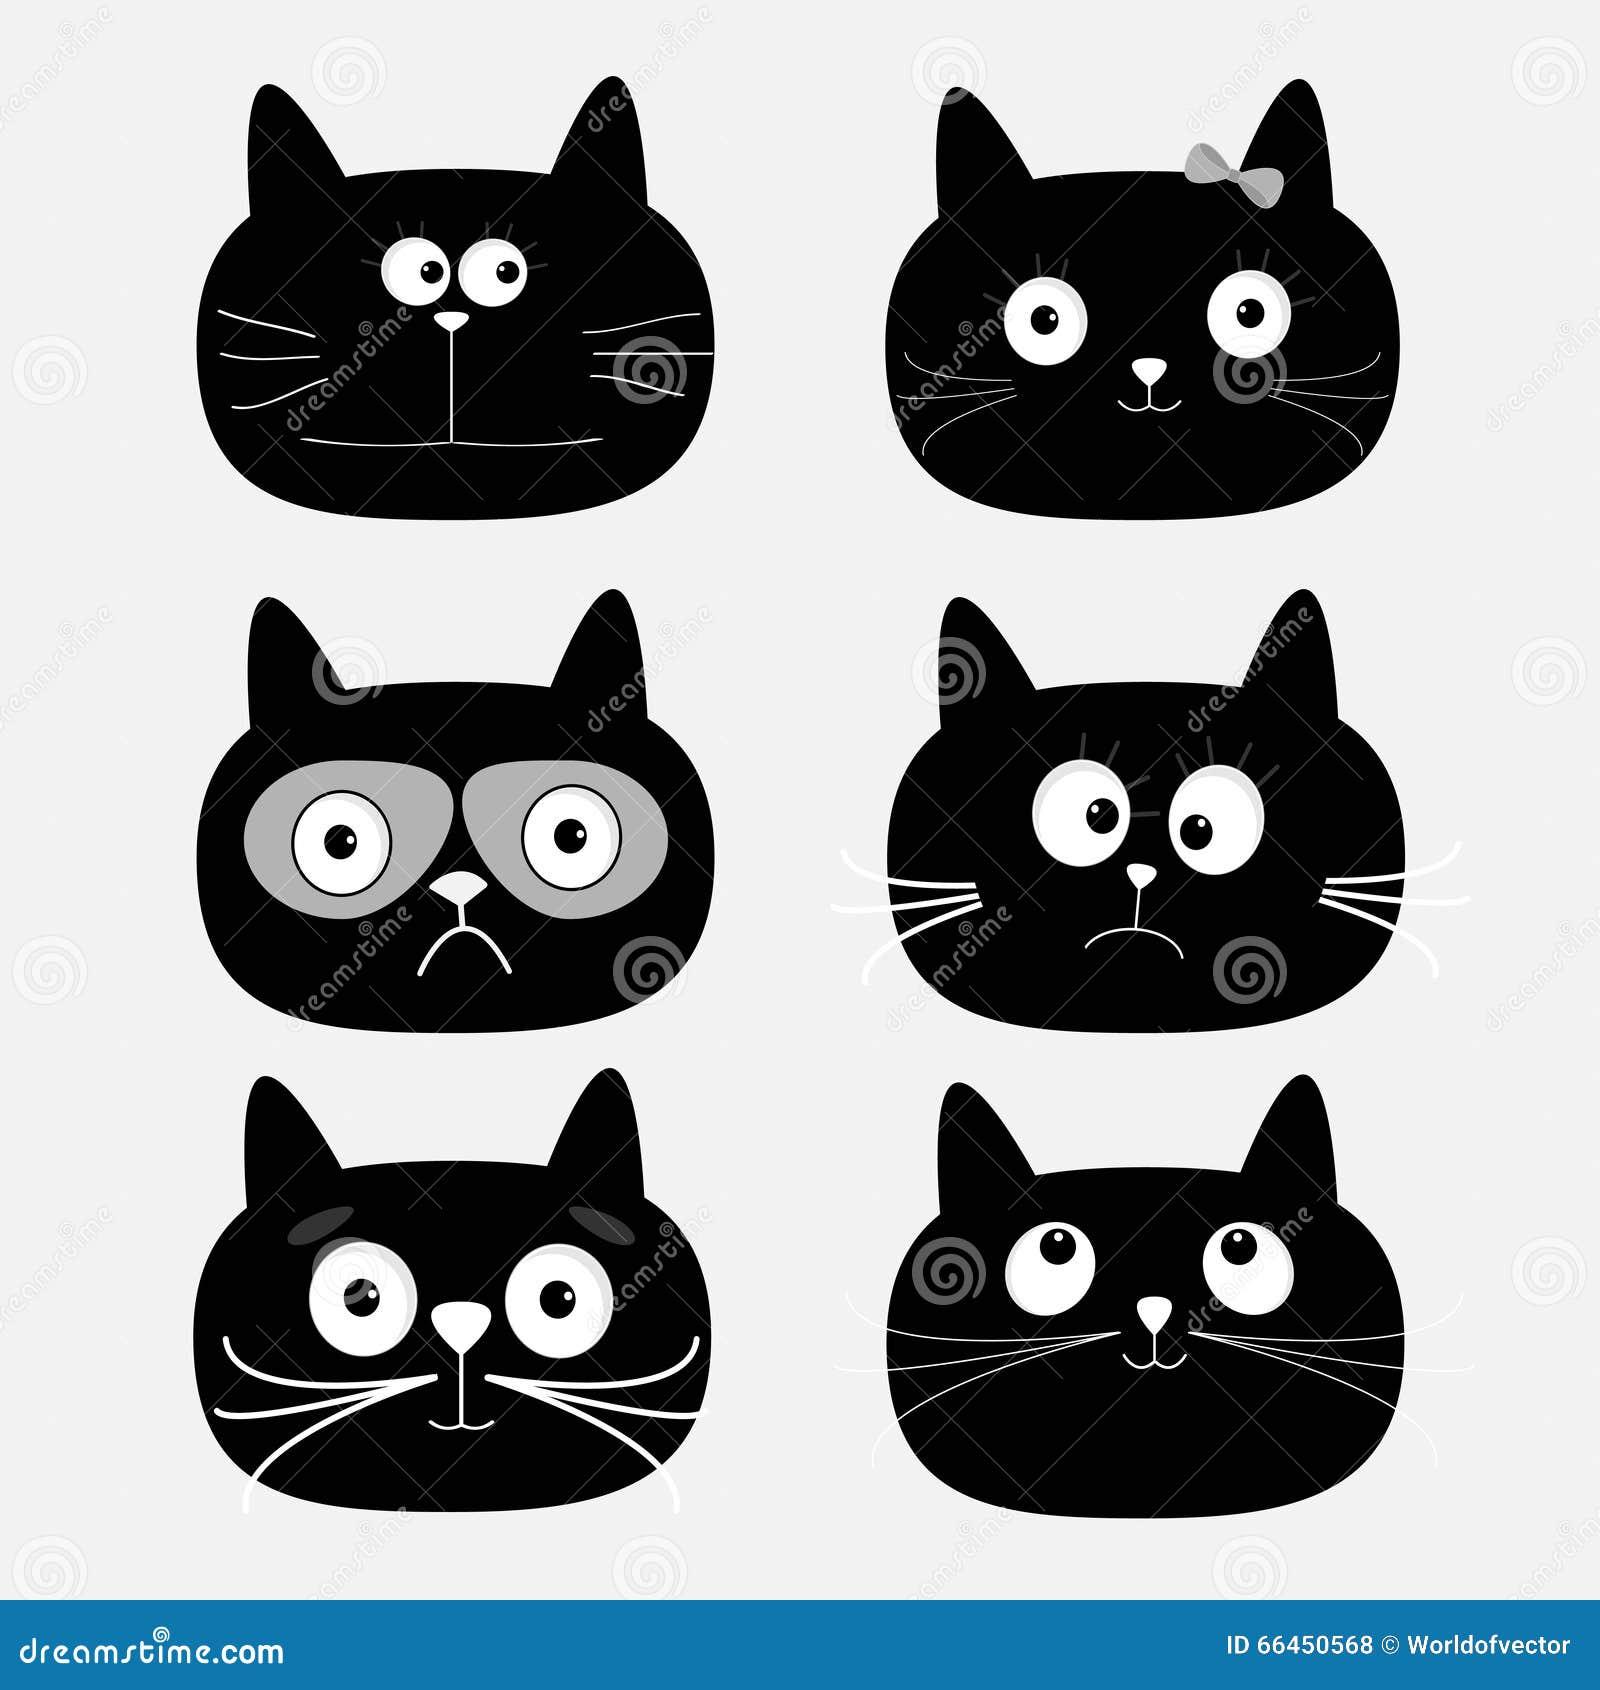 how to draw a black cat cartoon